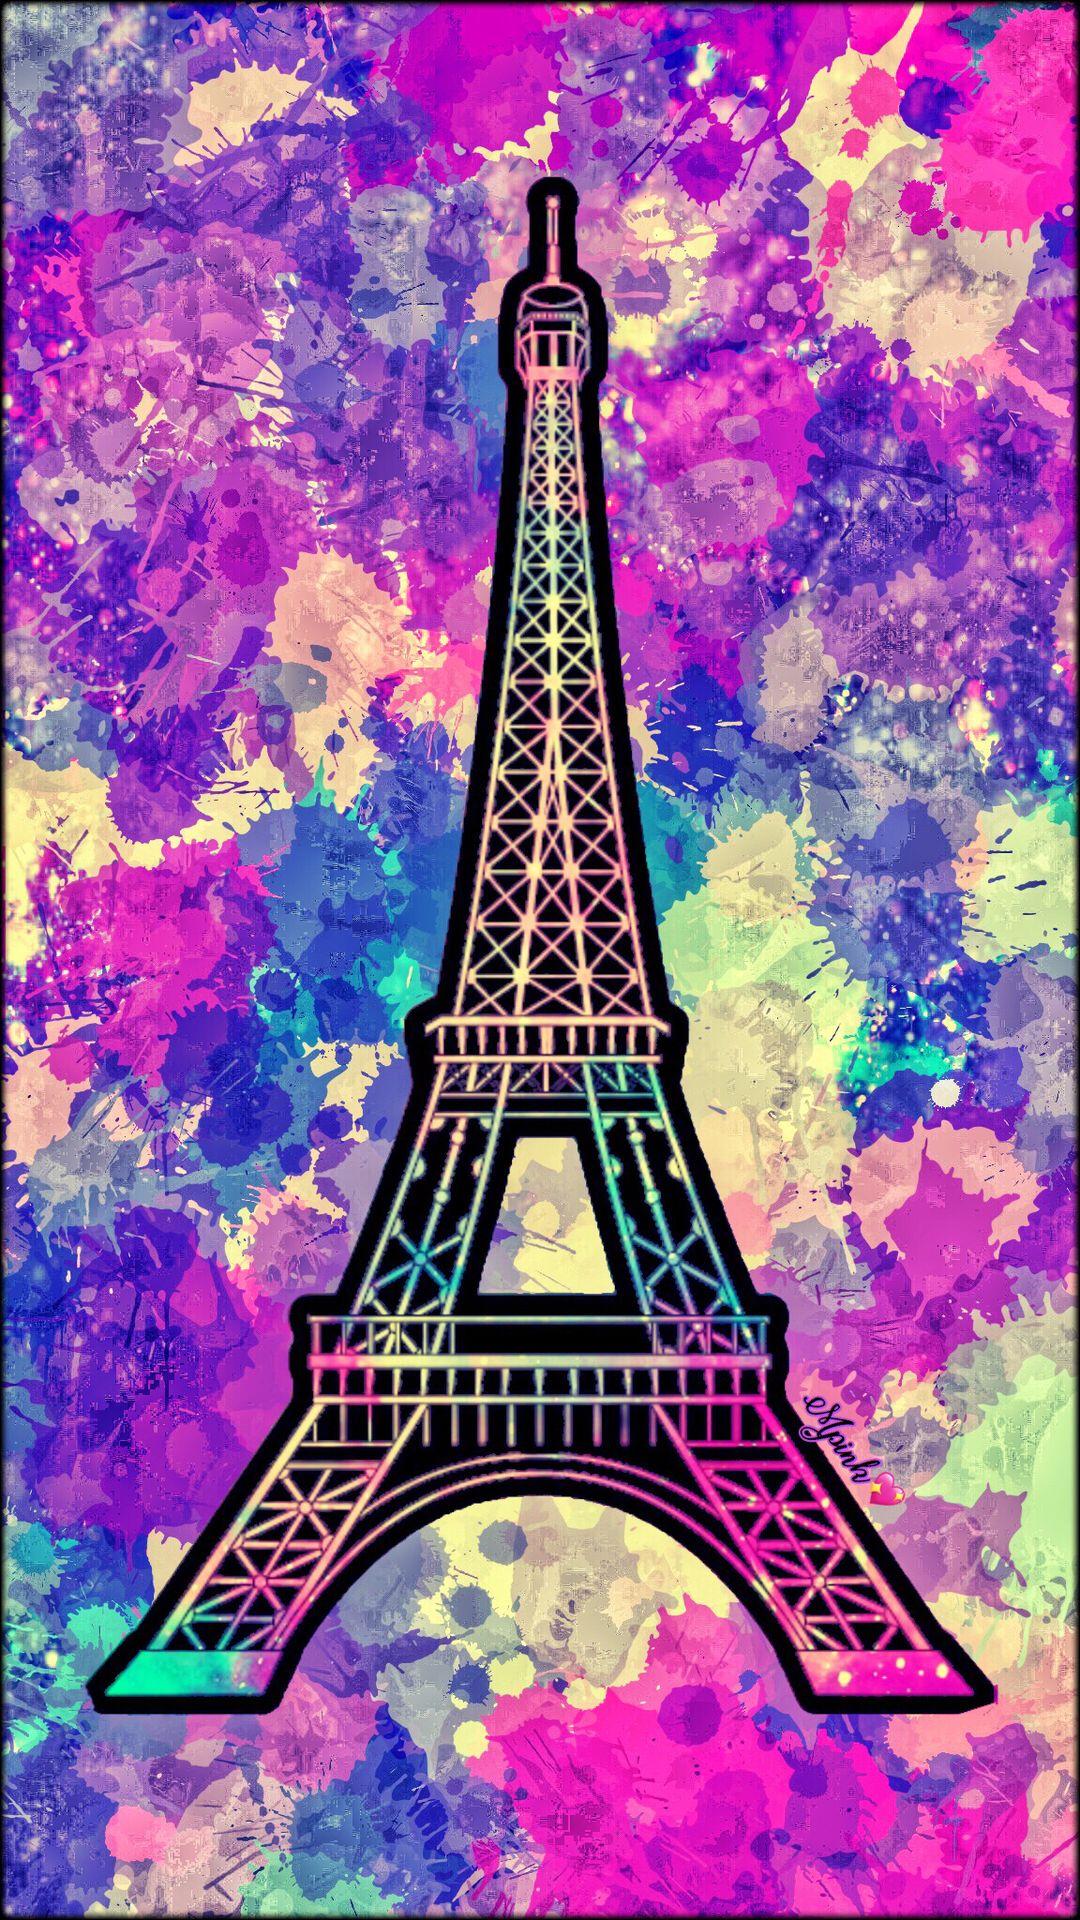 Splattered Eiffel Tower Galaxy Wallpaper Androidwallpaper Iphonewallpaper Wallpaper Galaxy Sparkle Glitter Lockscreen Pretty Pink Cute Europe Girly